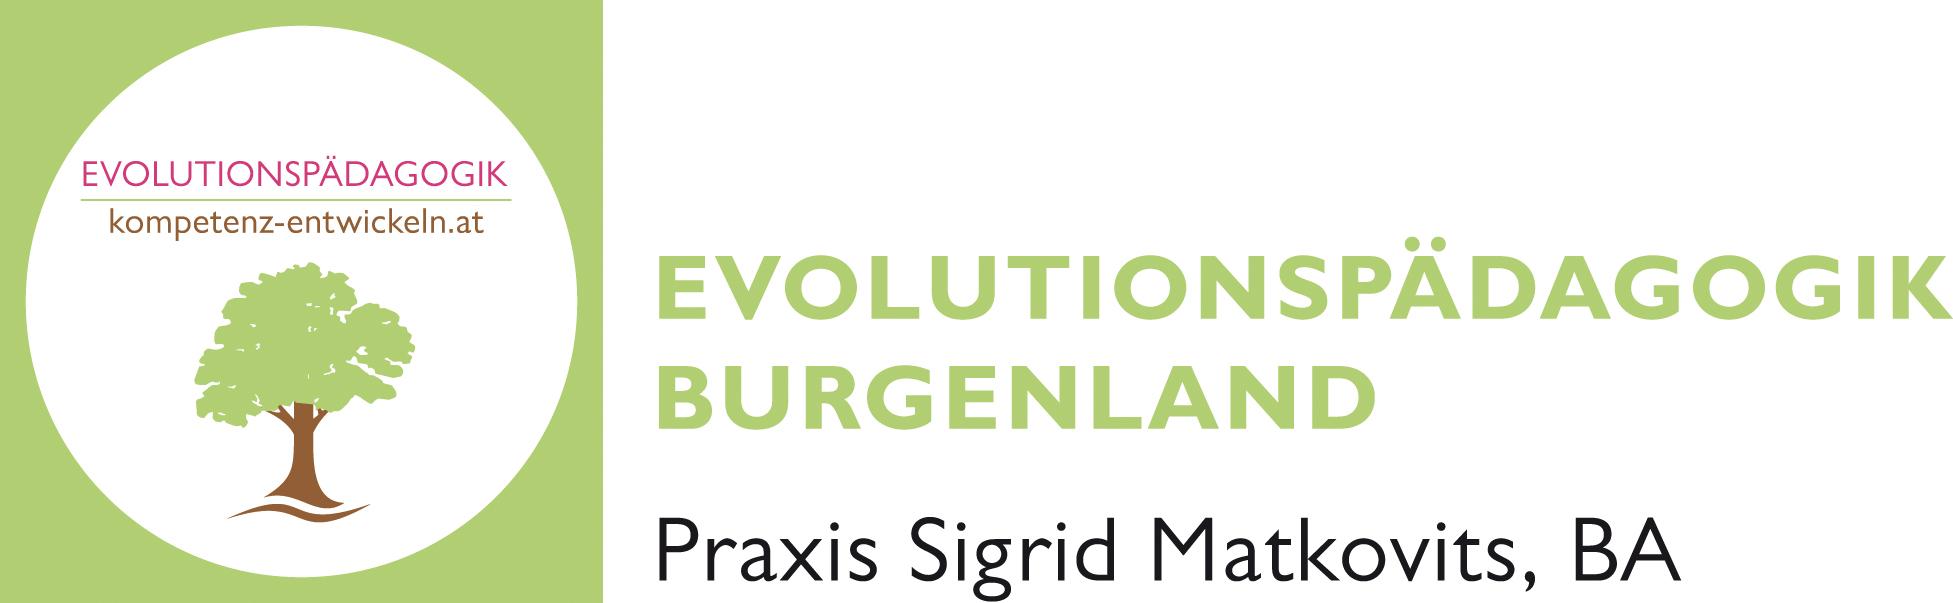 #Logo_Evolutionspädagogik